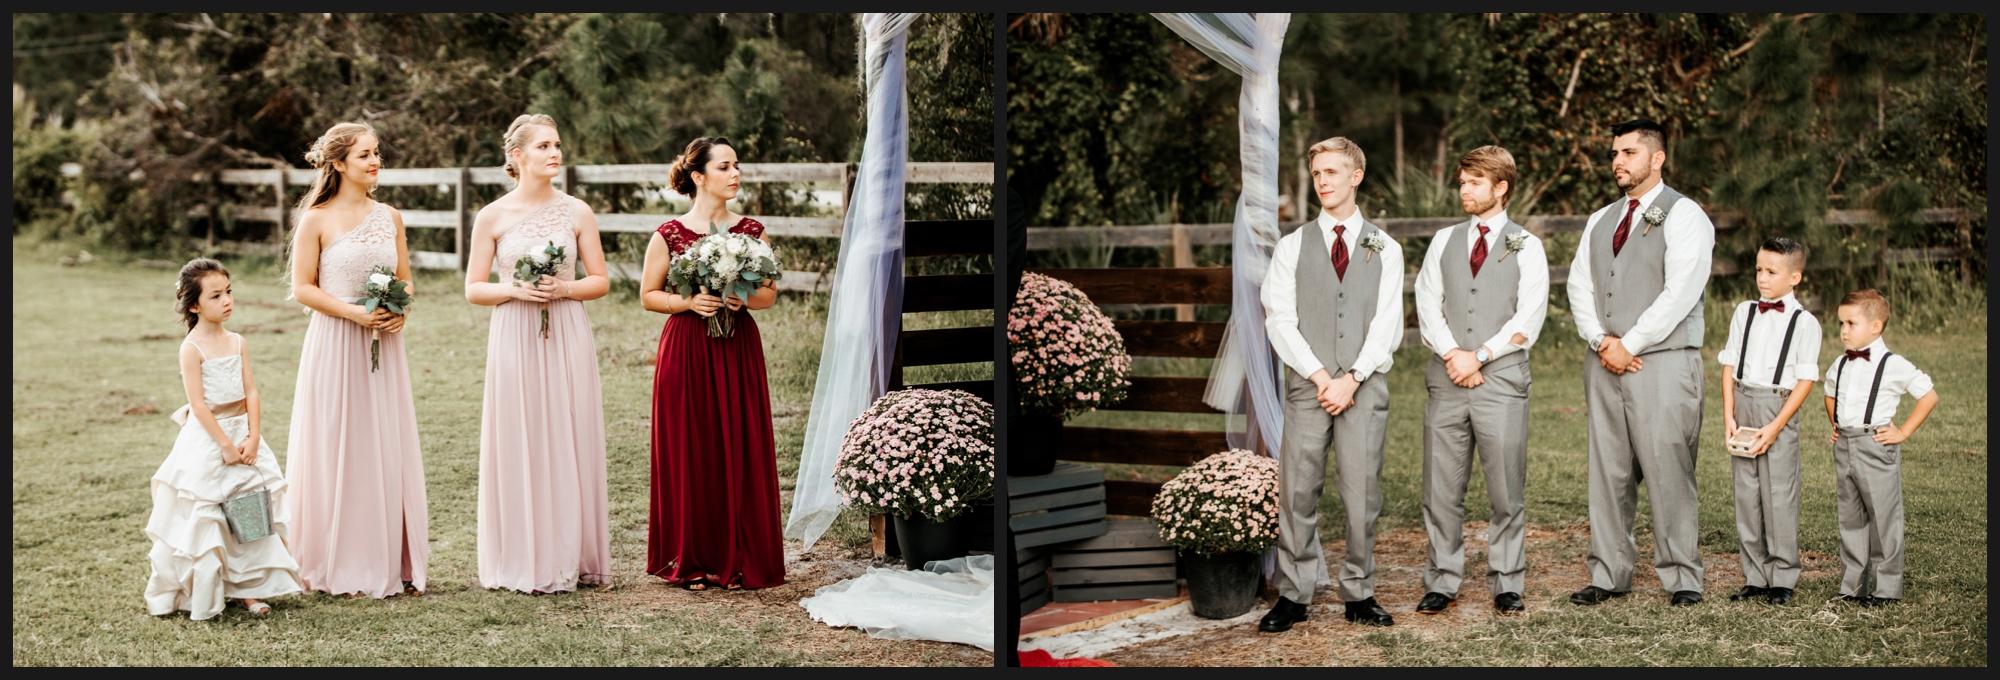 Orlando-Wedding-Photographer-destination-wedding-photographer-florida-wedding-photographer-bohemian-wedding-photographer_0289.jpg